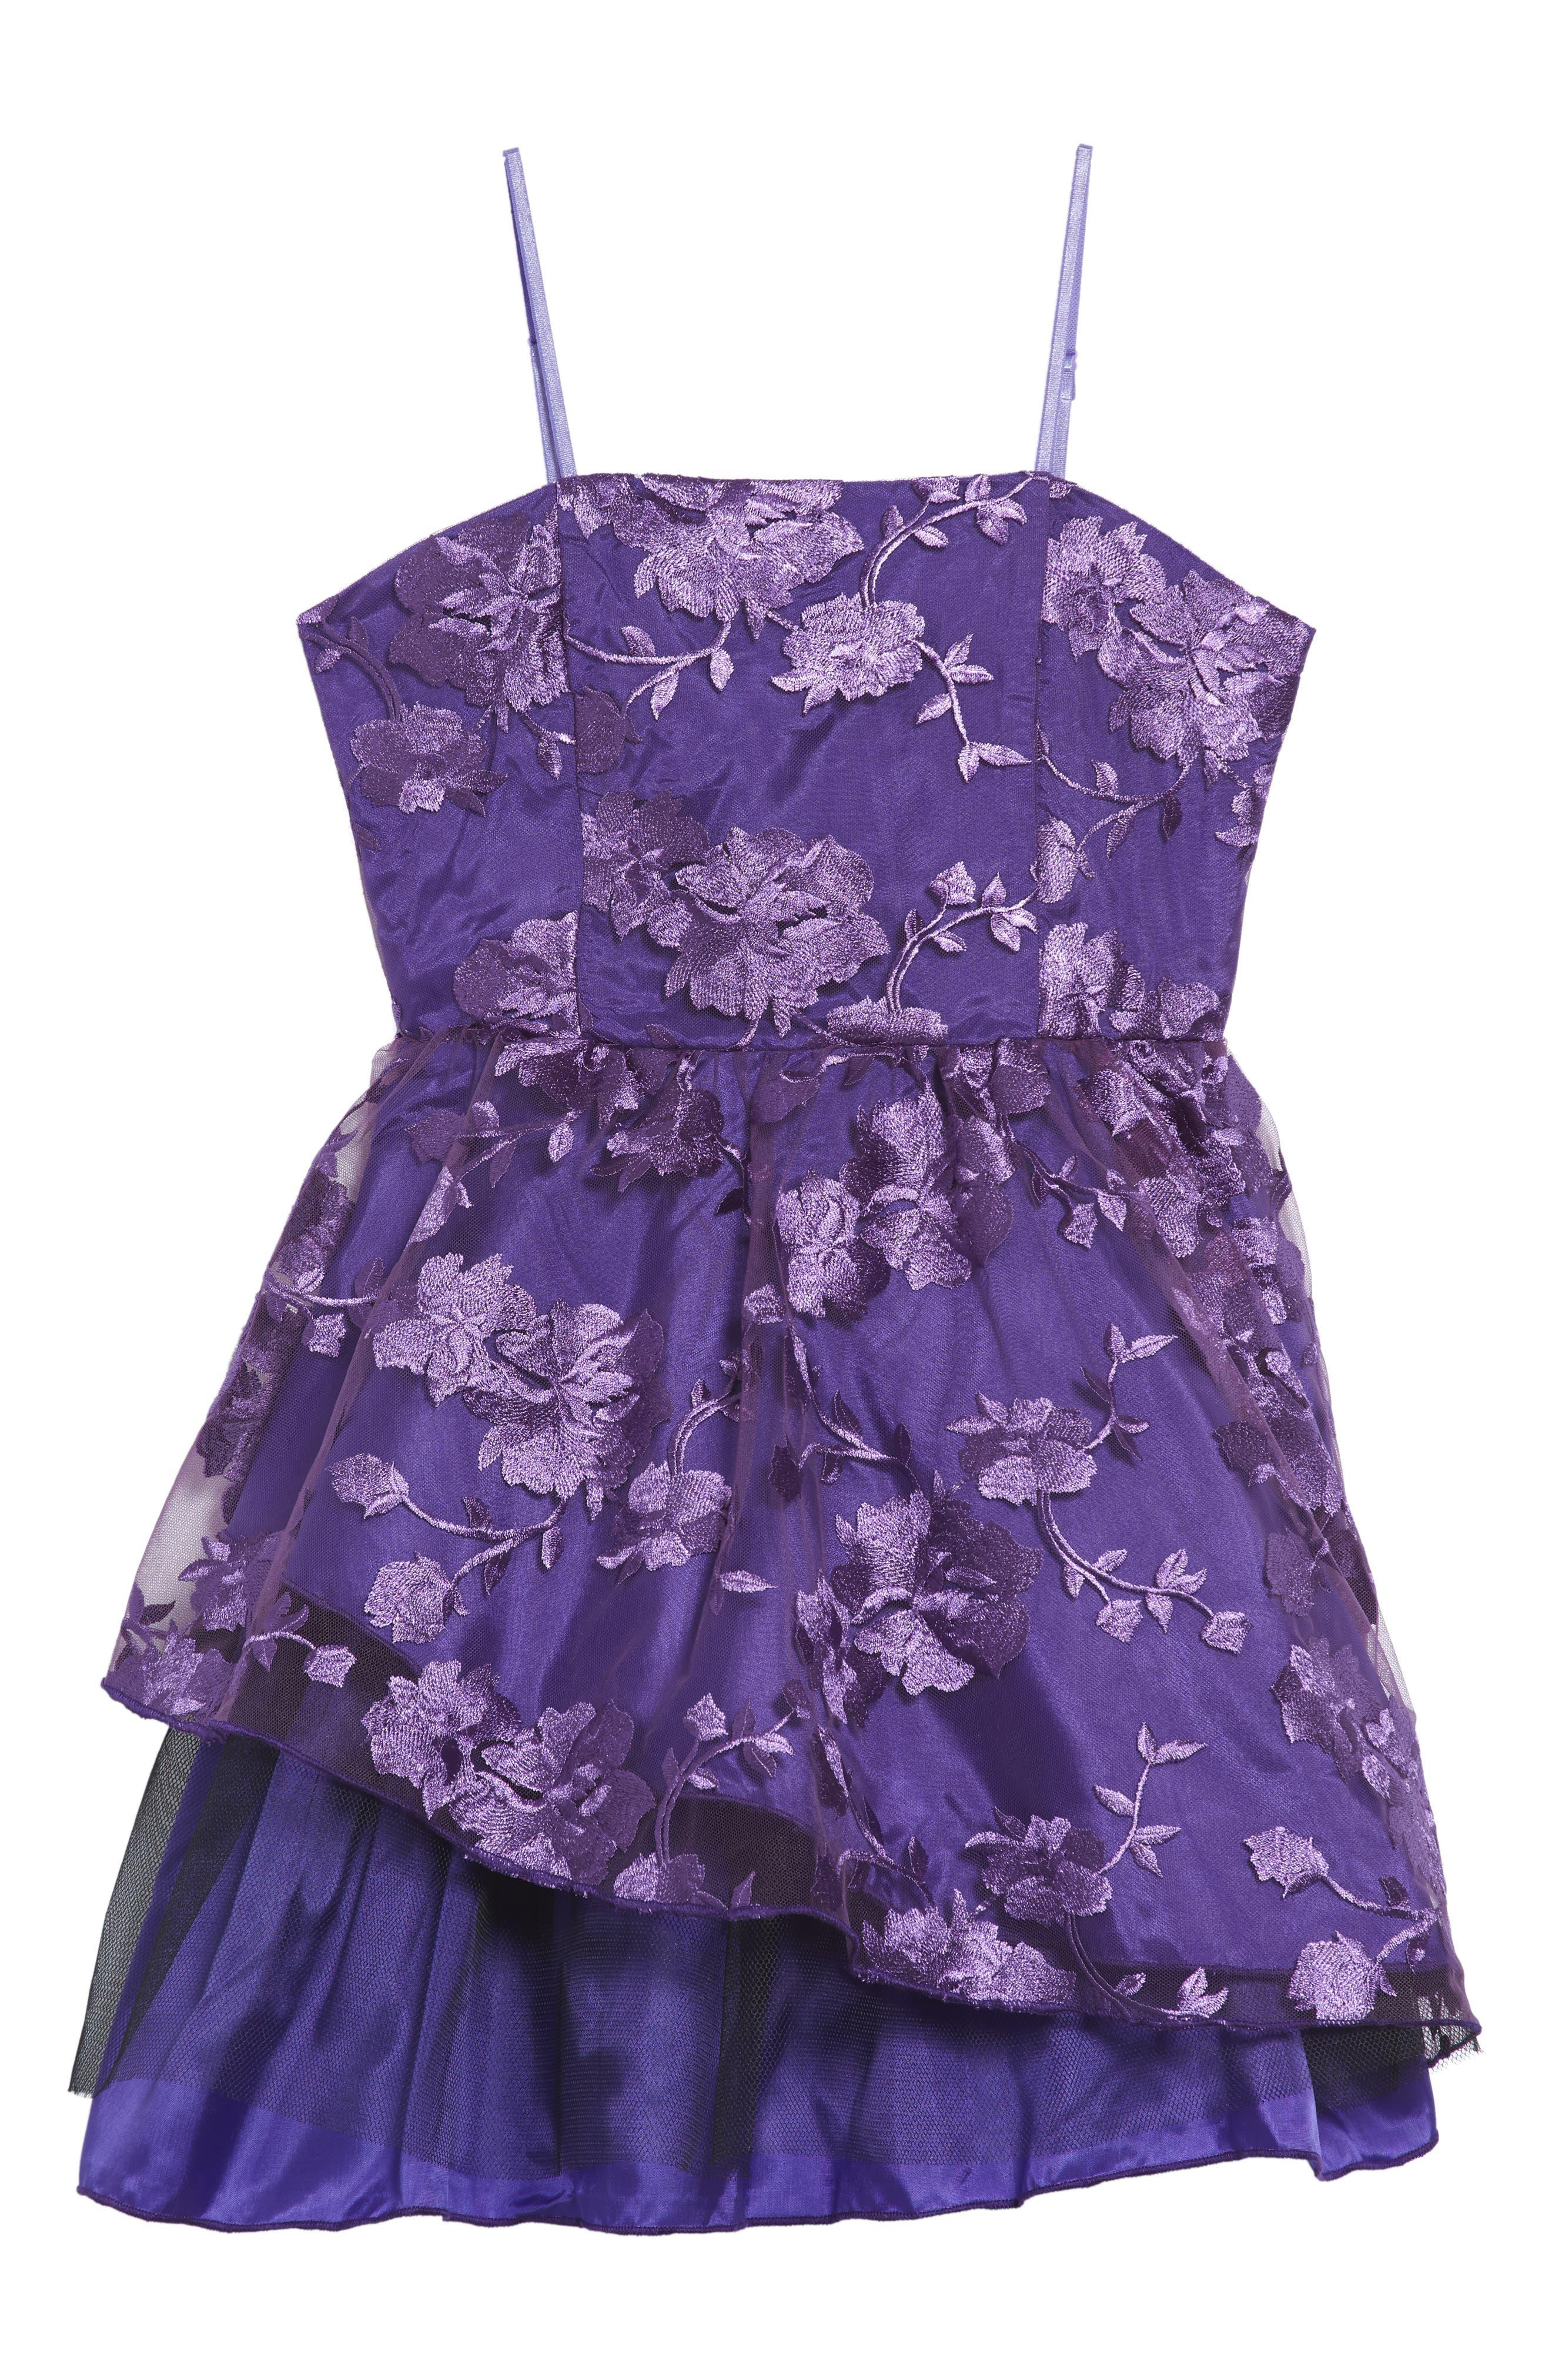 Floral Mesh Sleeveless Dress,                             Main thumbnail 1, color,                             Plum